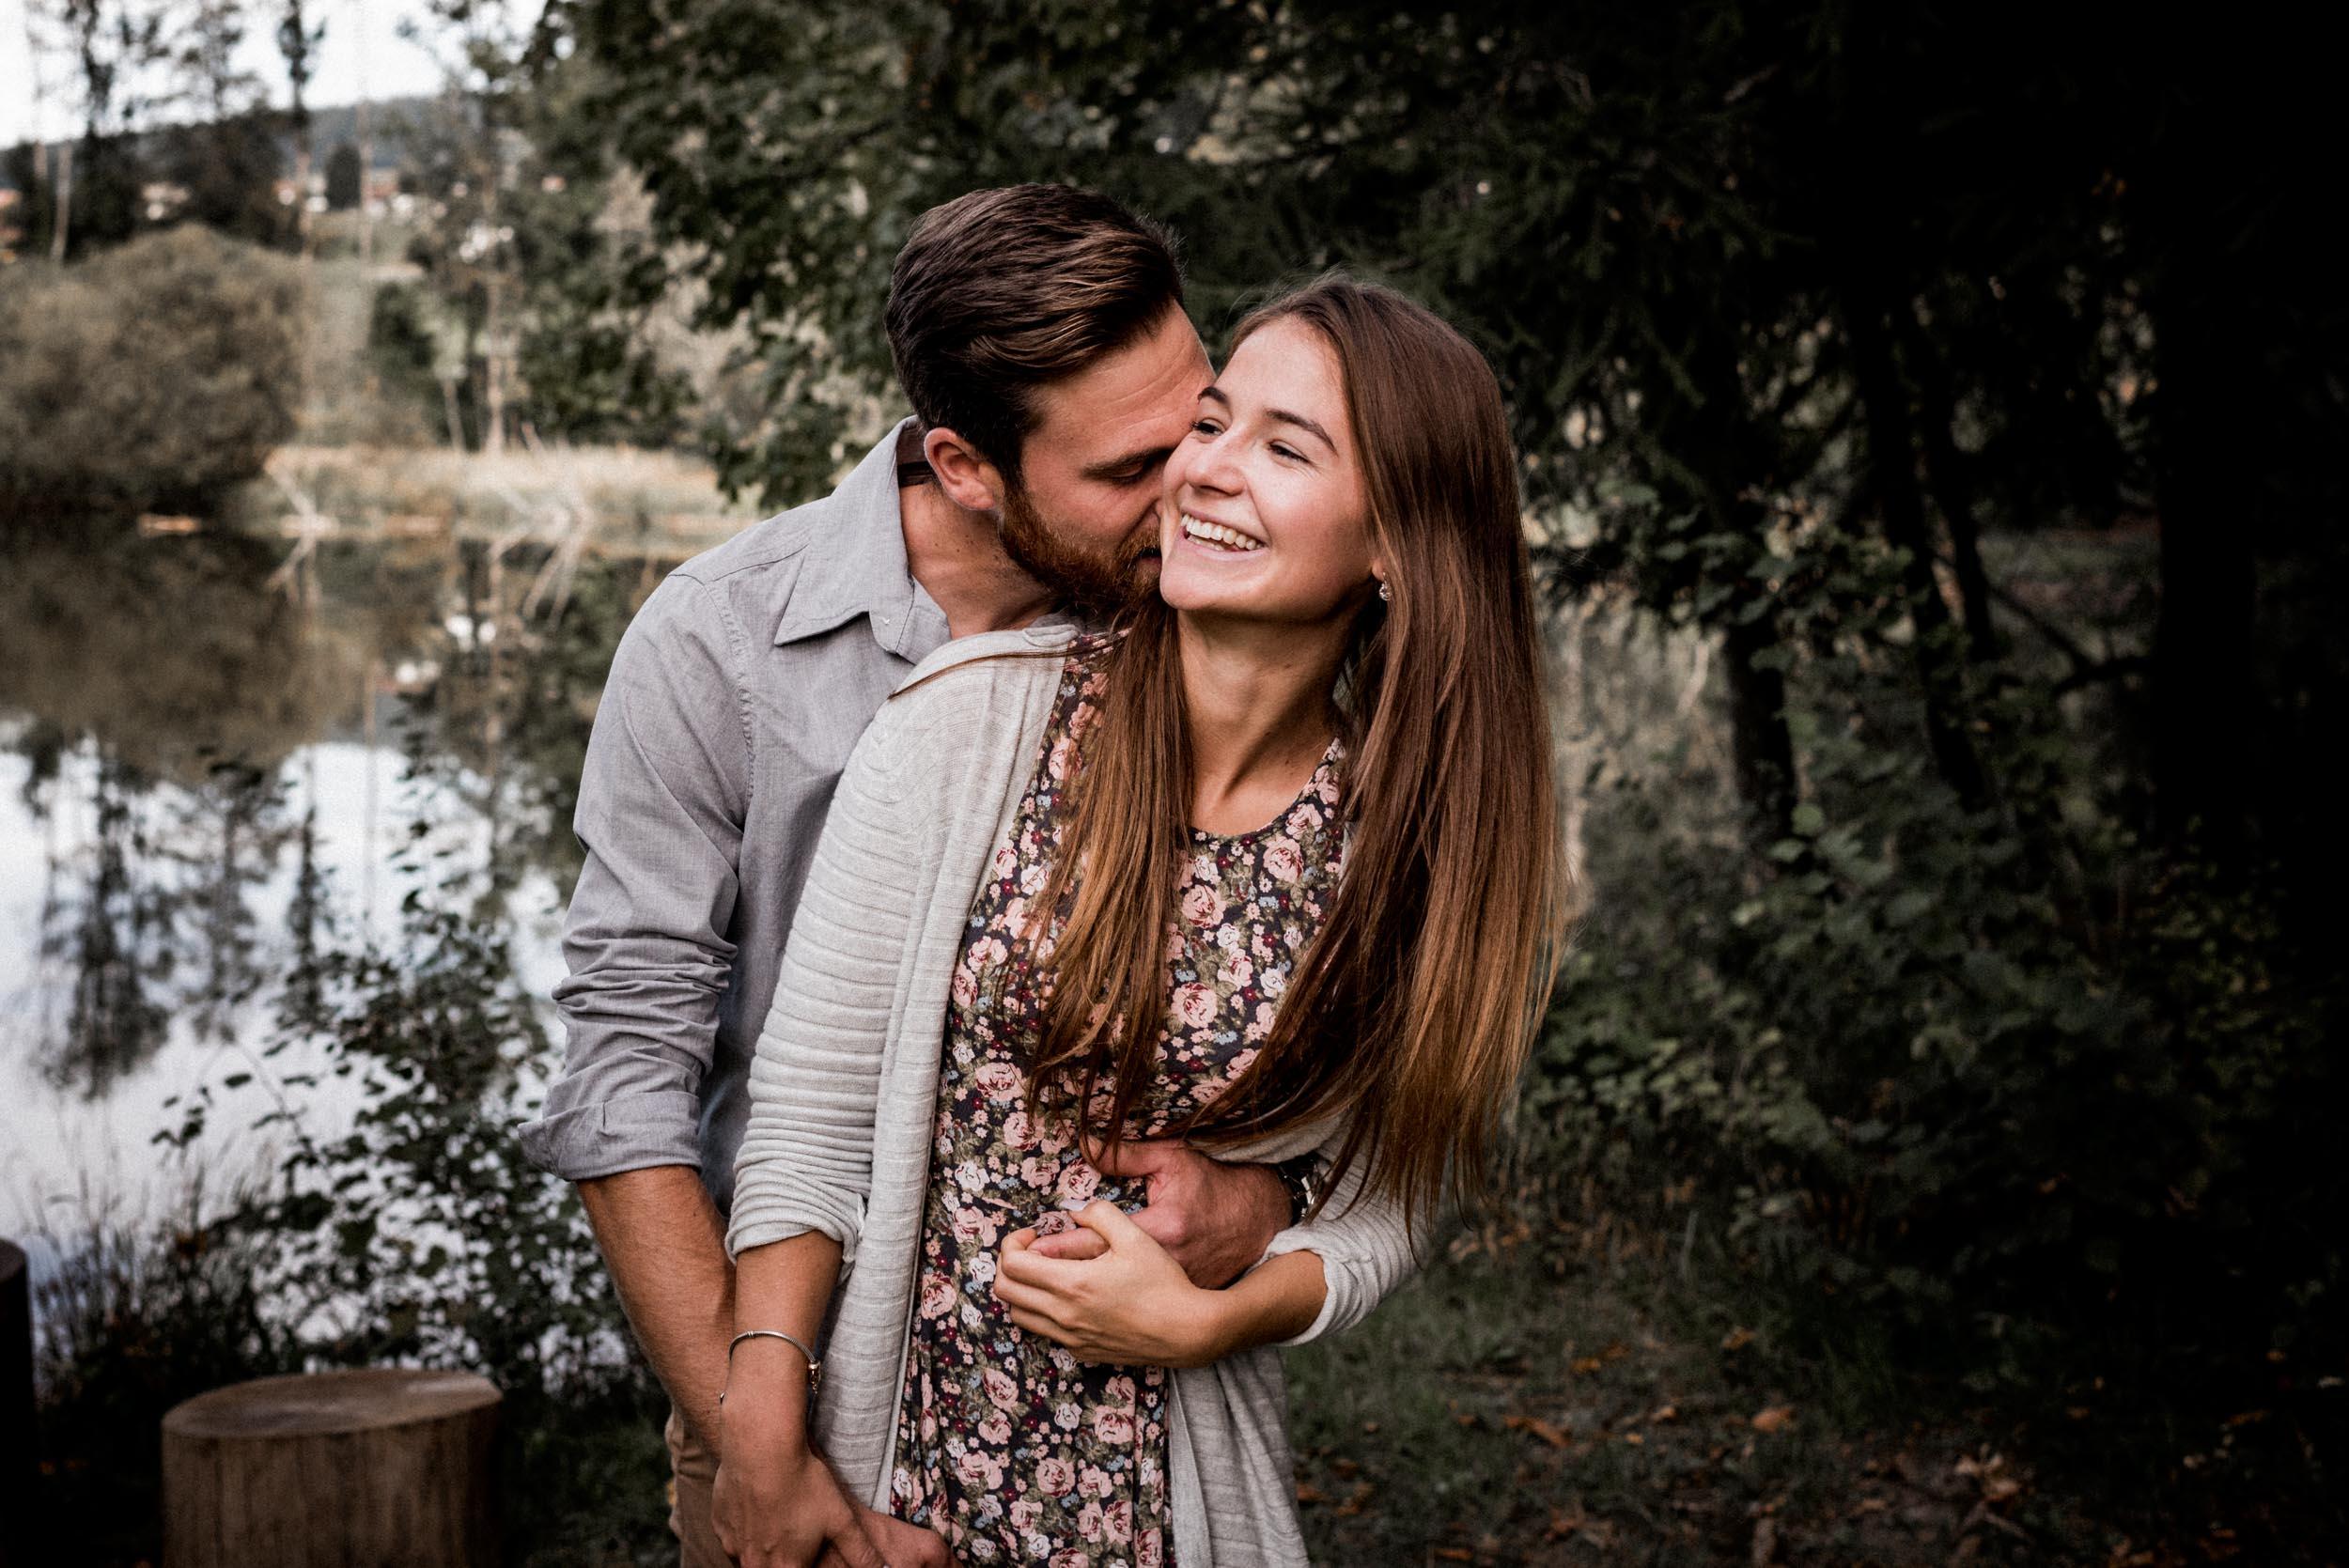 Couple-Shooting_2019_6.jpg